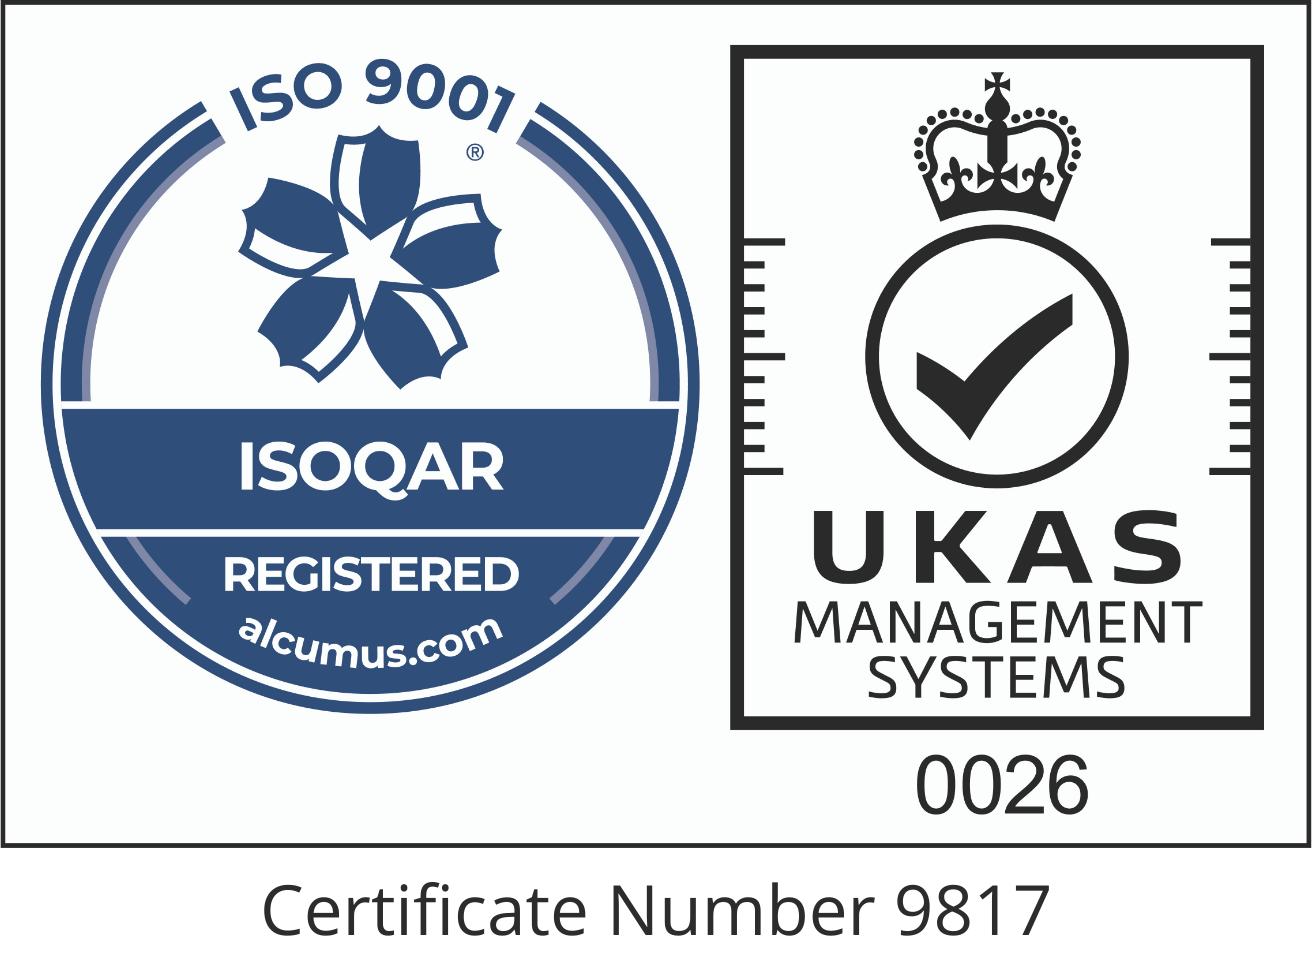 2021 Logo Certificate Number 9817